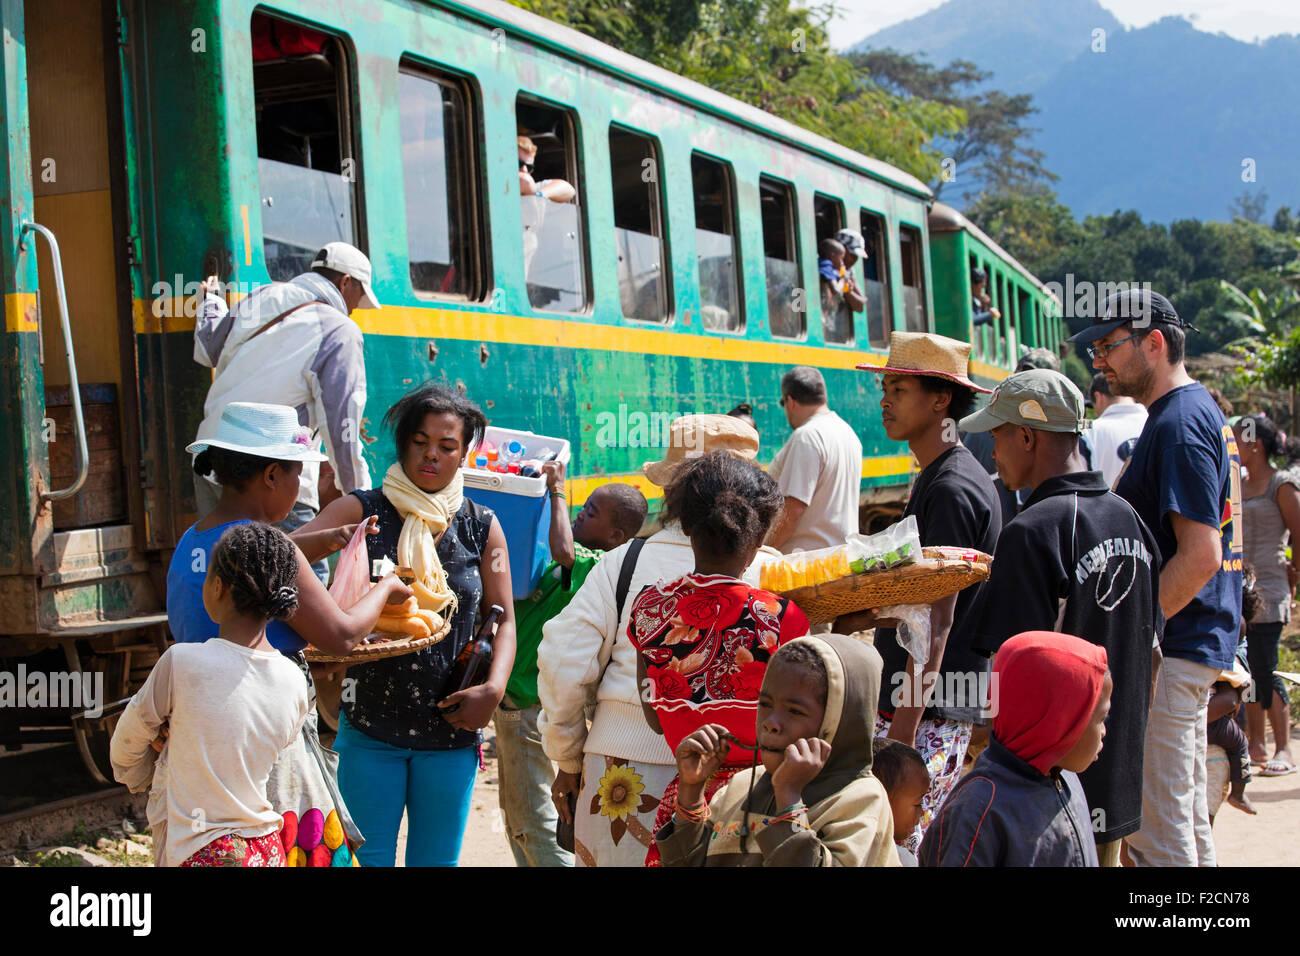 Vendors selling food on platform of railway station to passengers boarding train from Fianarantsoa to Manakara, - Stock Image